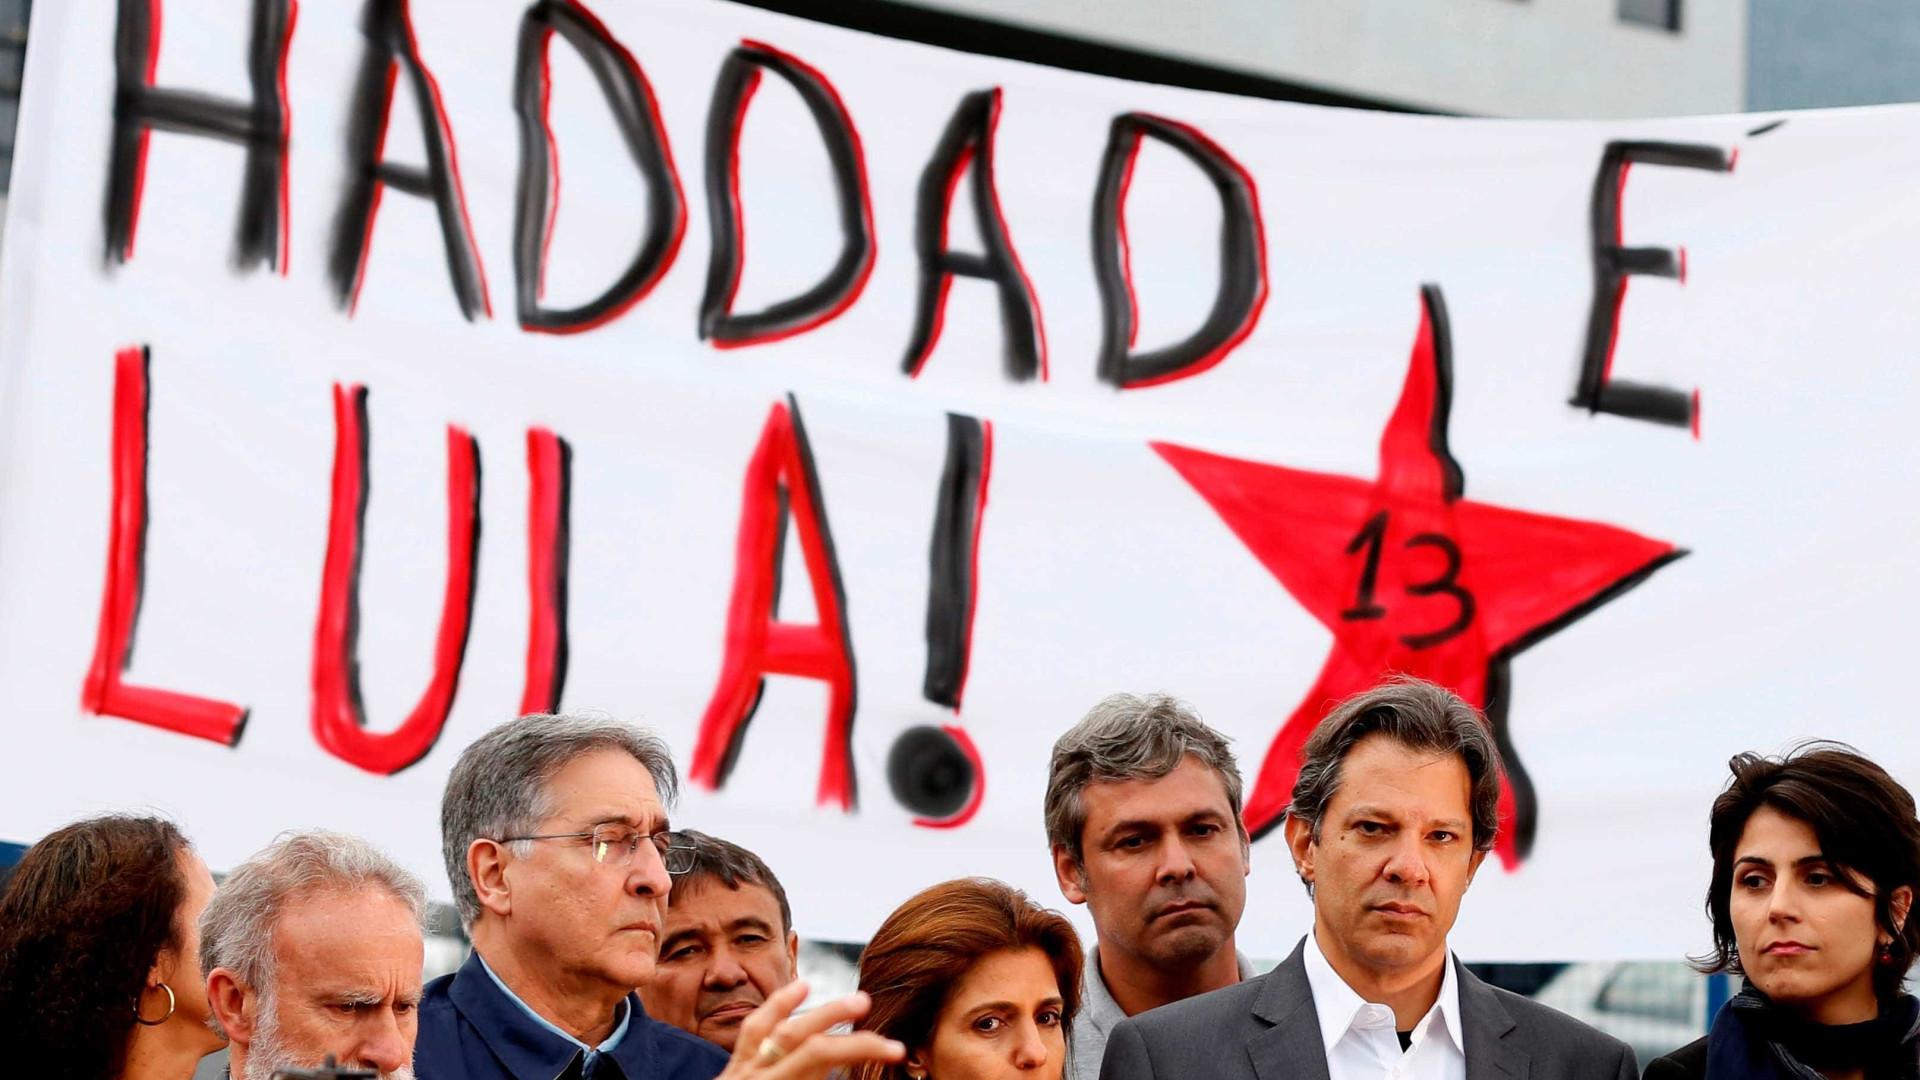 'Haddad será Lula para milhares de brasileiros', diz campanha petista